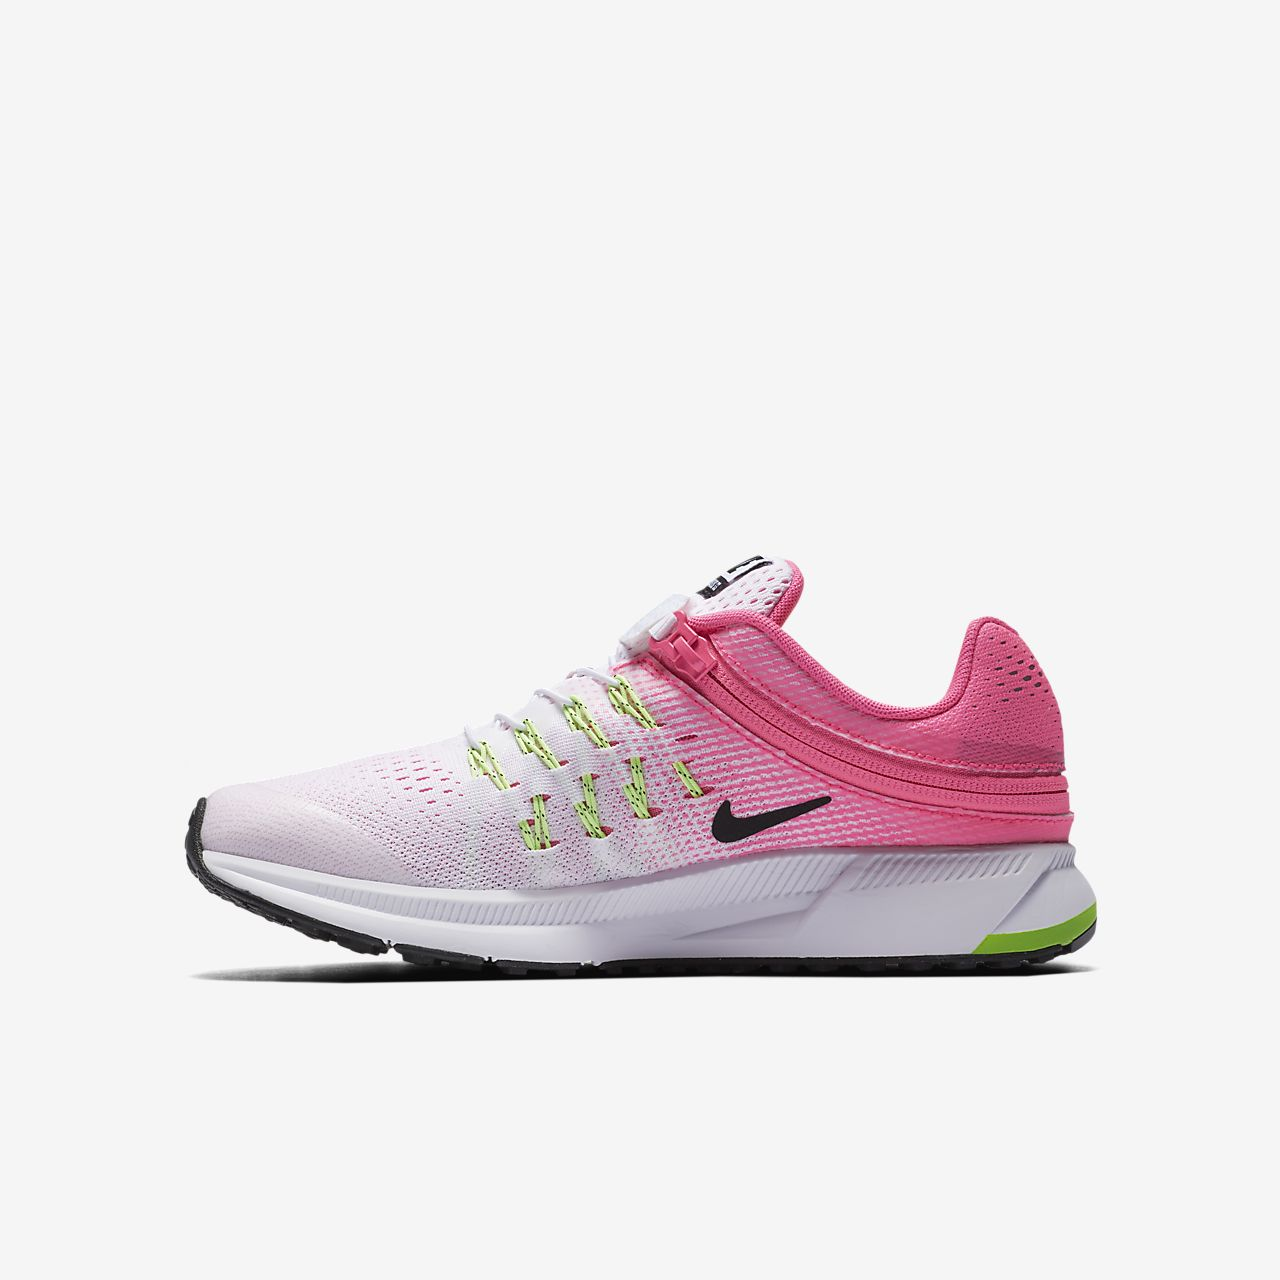 83f93a752b6a ... WhiteConcordBlack Nike Air Zoom Pegasus 33 FlyEase LittleBig Kids  Running Shoe . ...